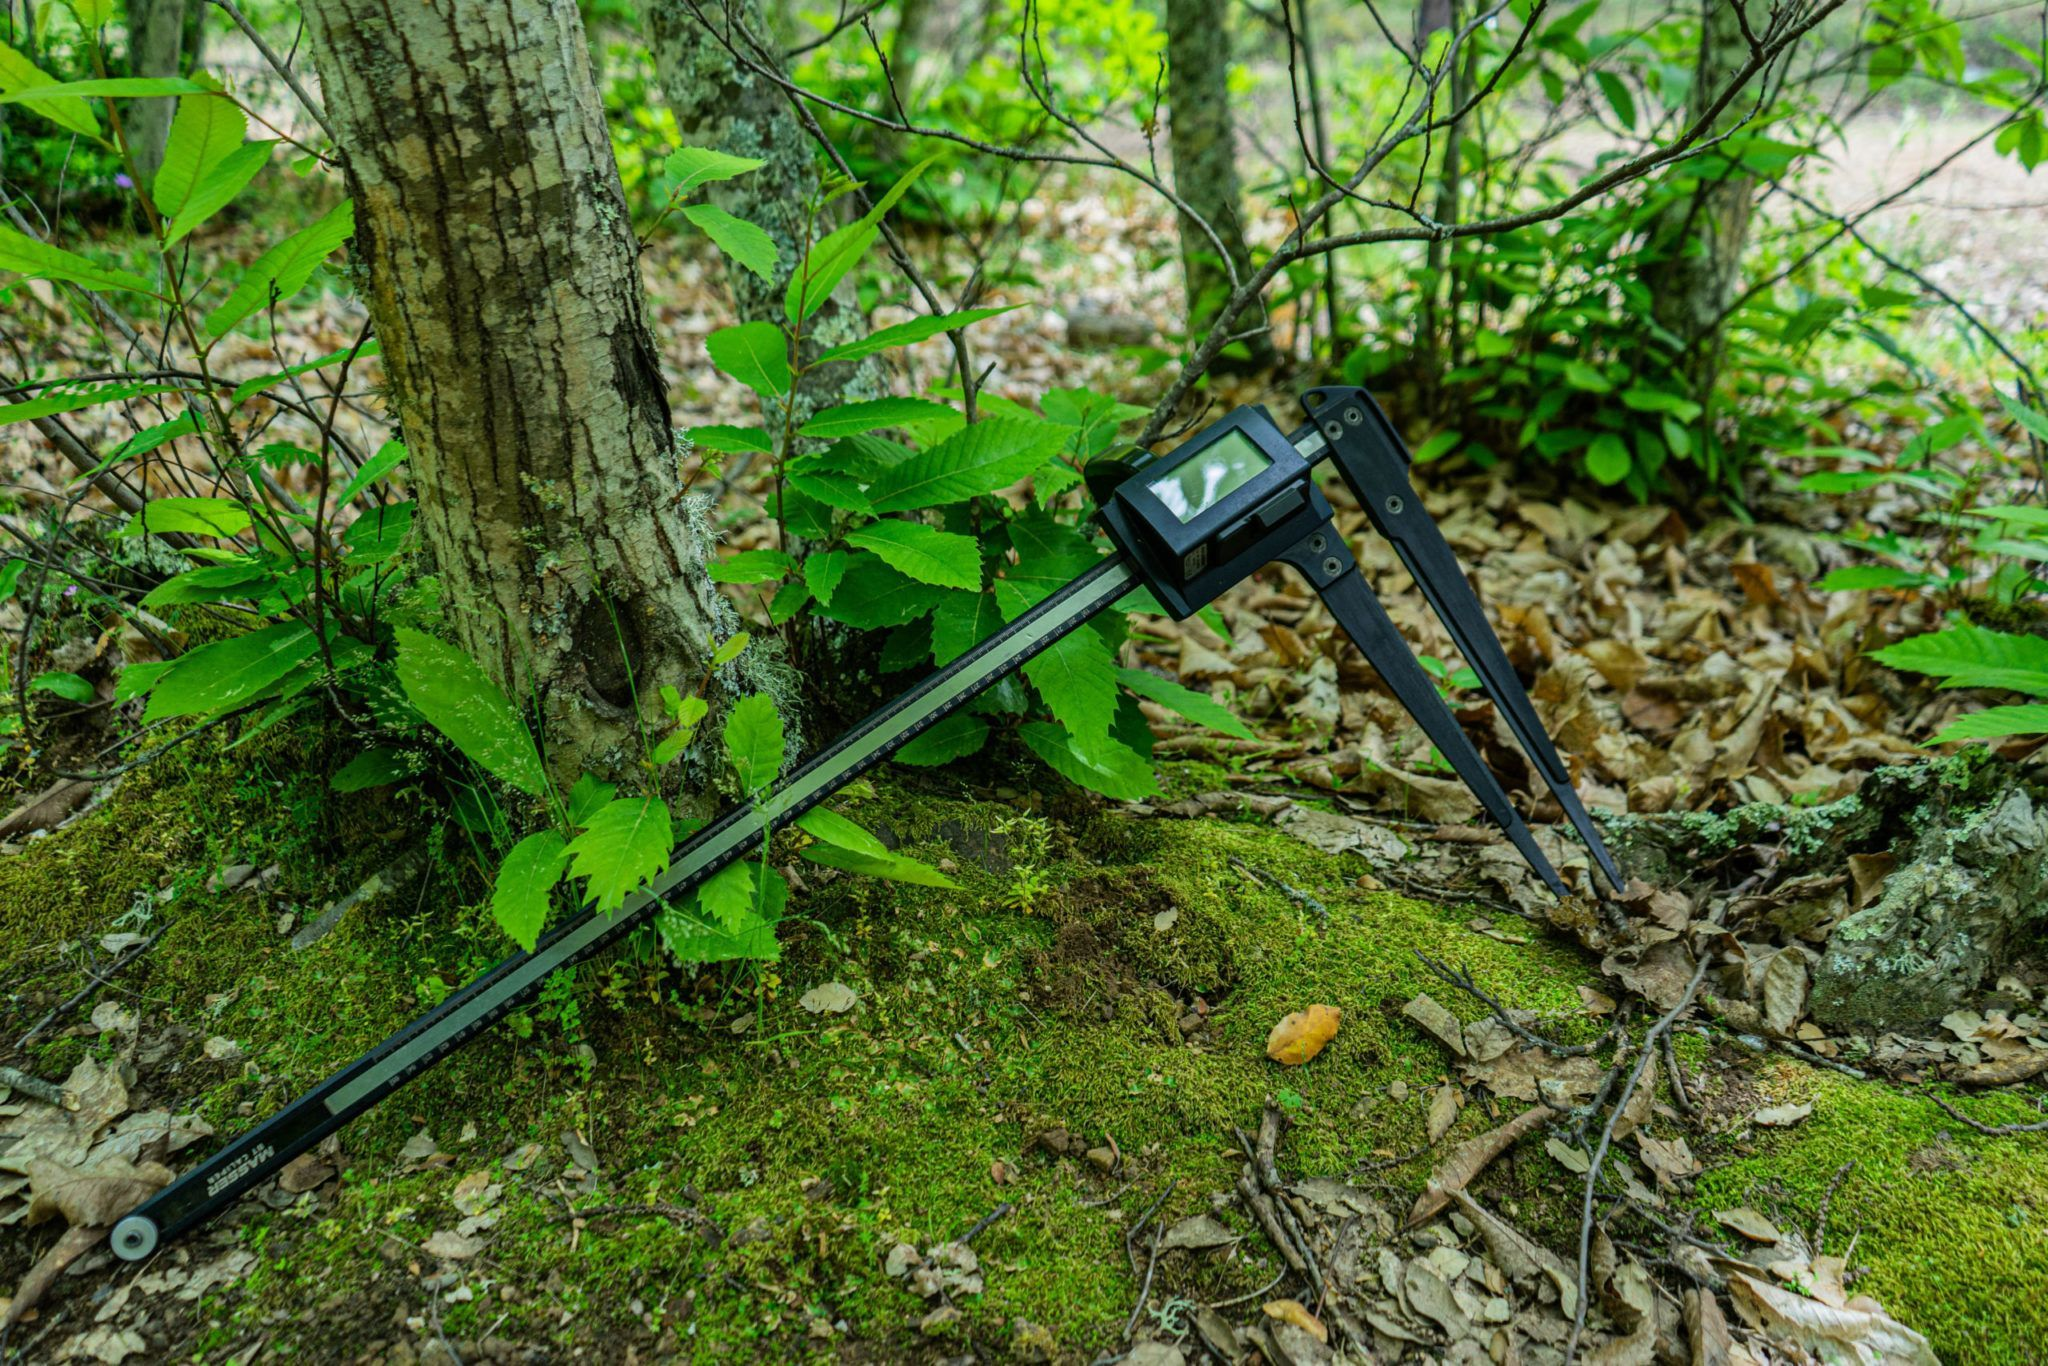 Field-Map Forest Collector, alquiler de equipos Field-Map, alquiler de equipos de medición